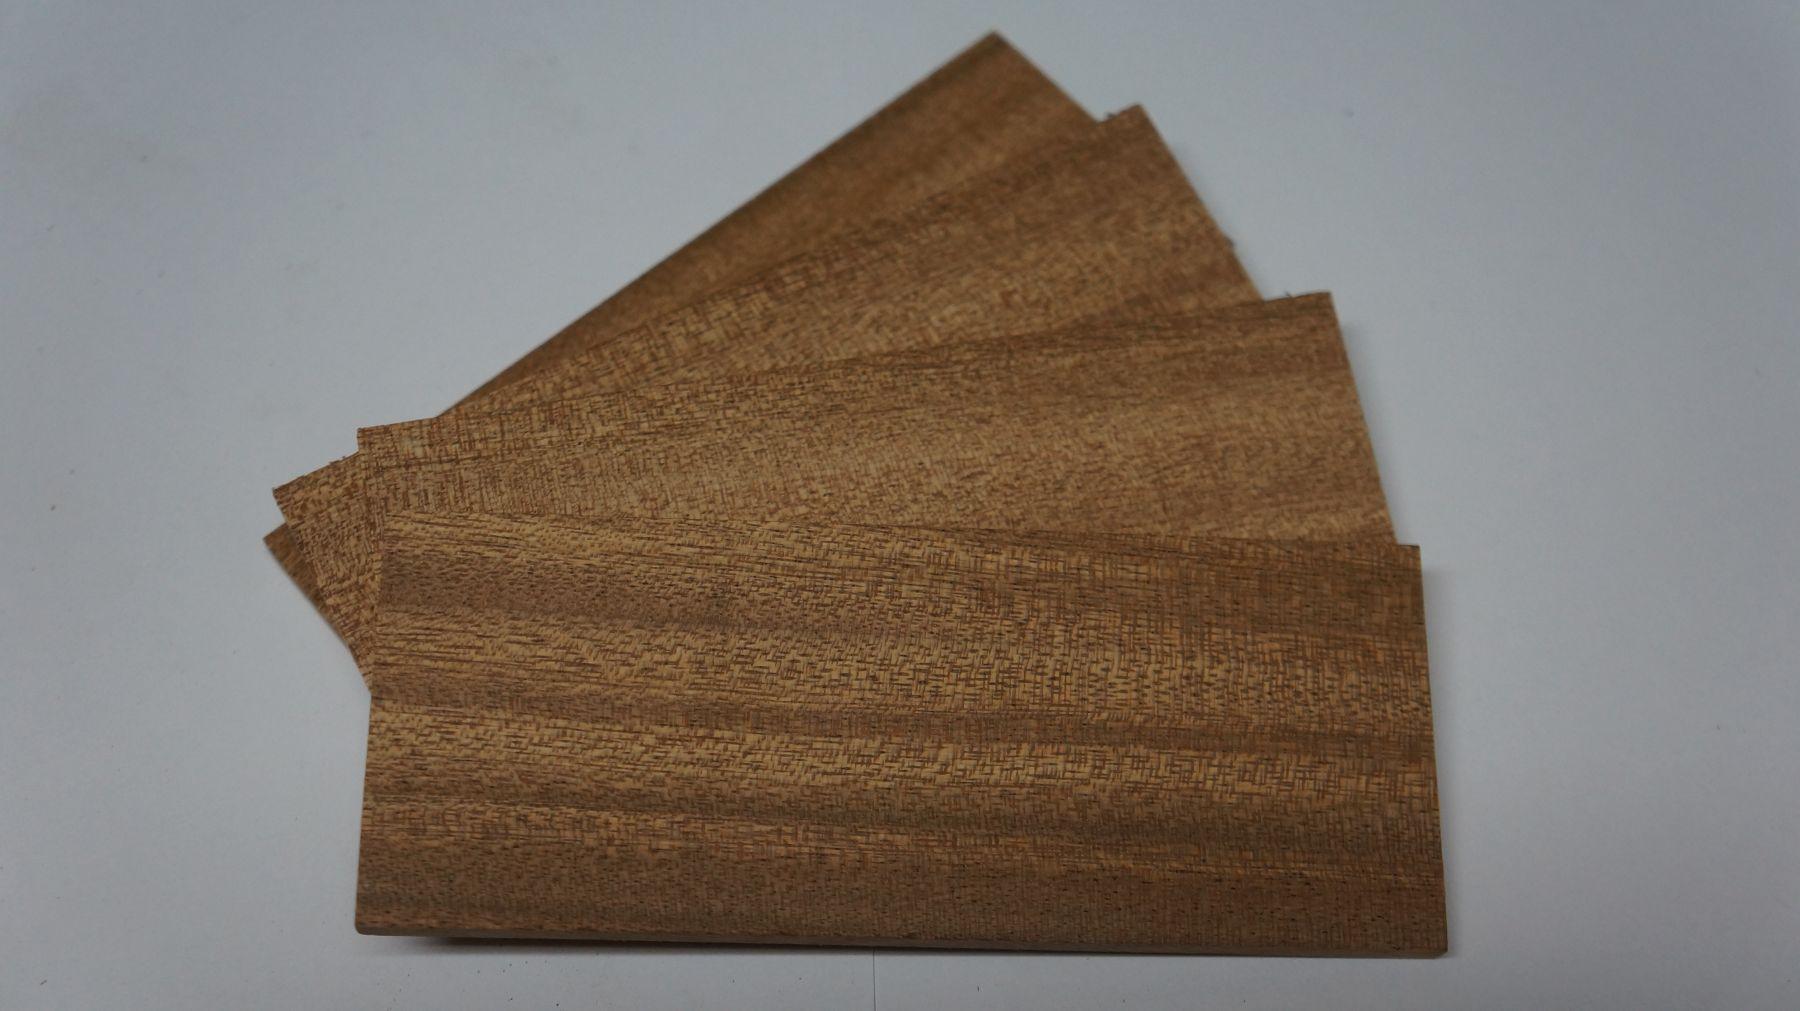 Тьяма/ Тиама плашки 5-7-10-14 мм (толщина выбирается при клике на товар)